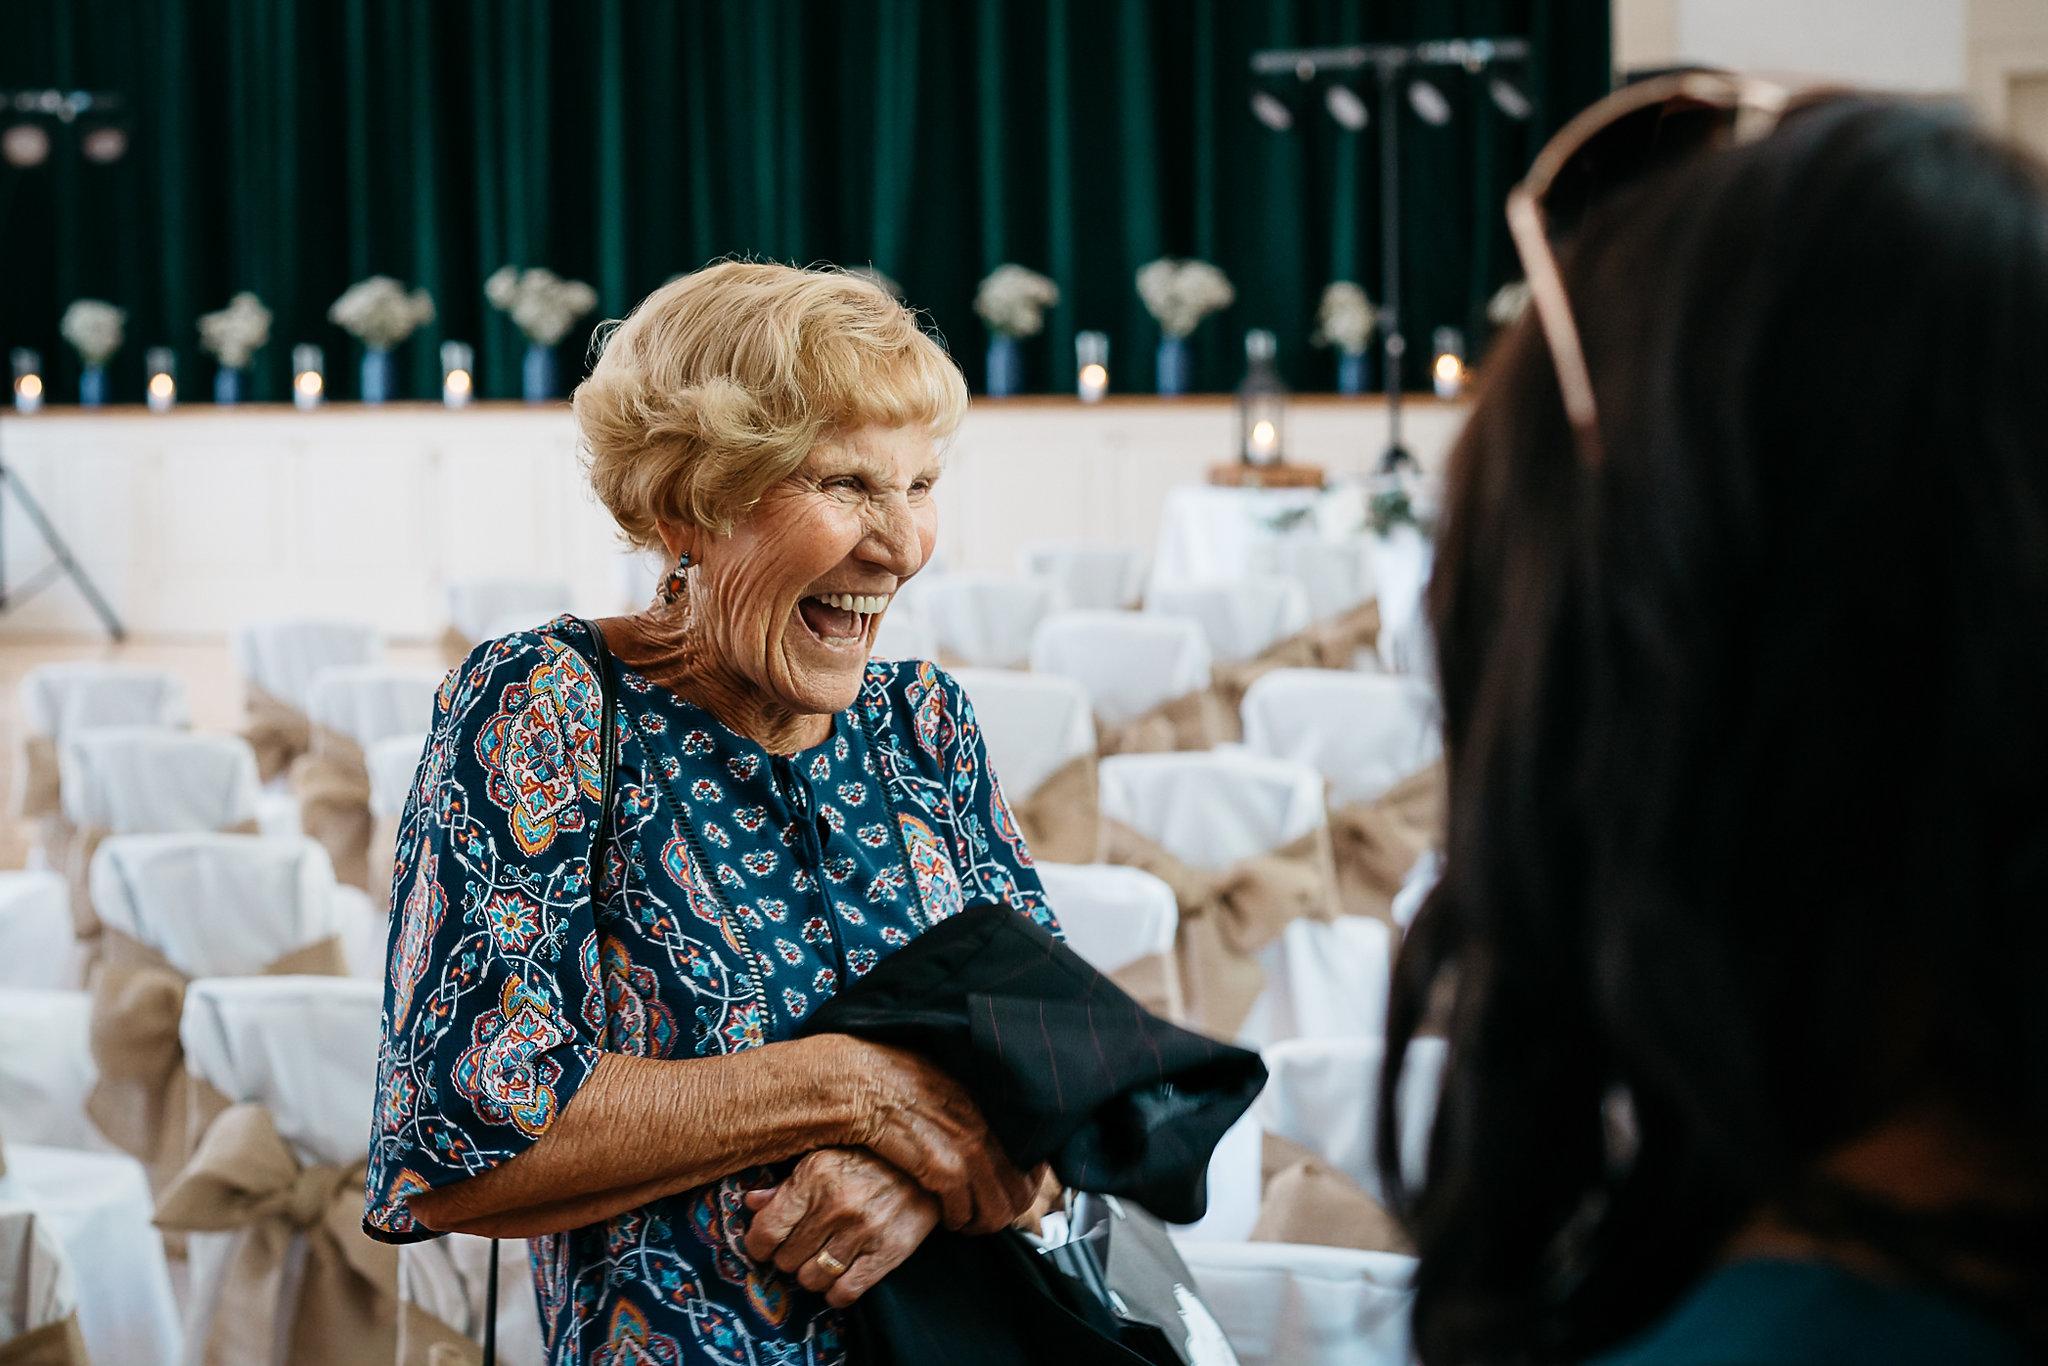 Jen_Kyle_Wedding_03_Ceremony-9.jpg